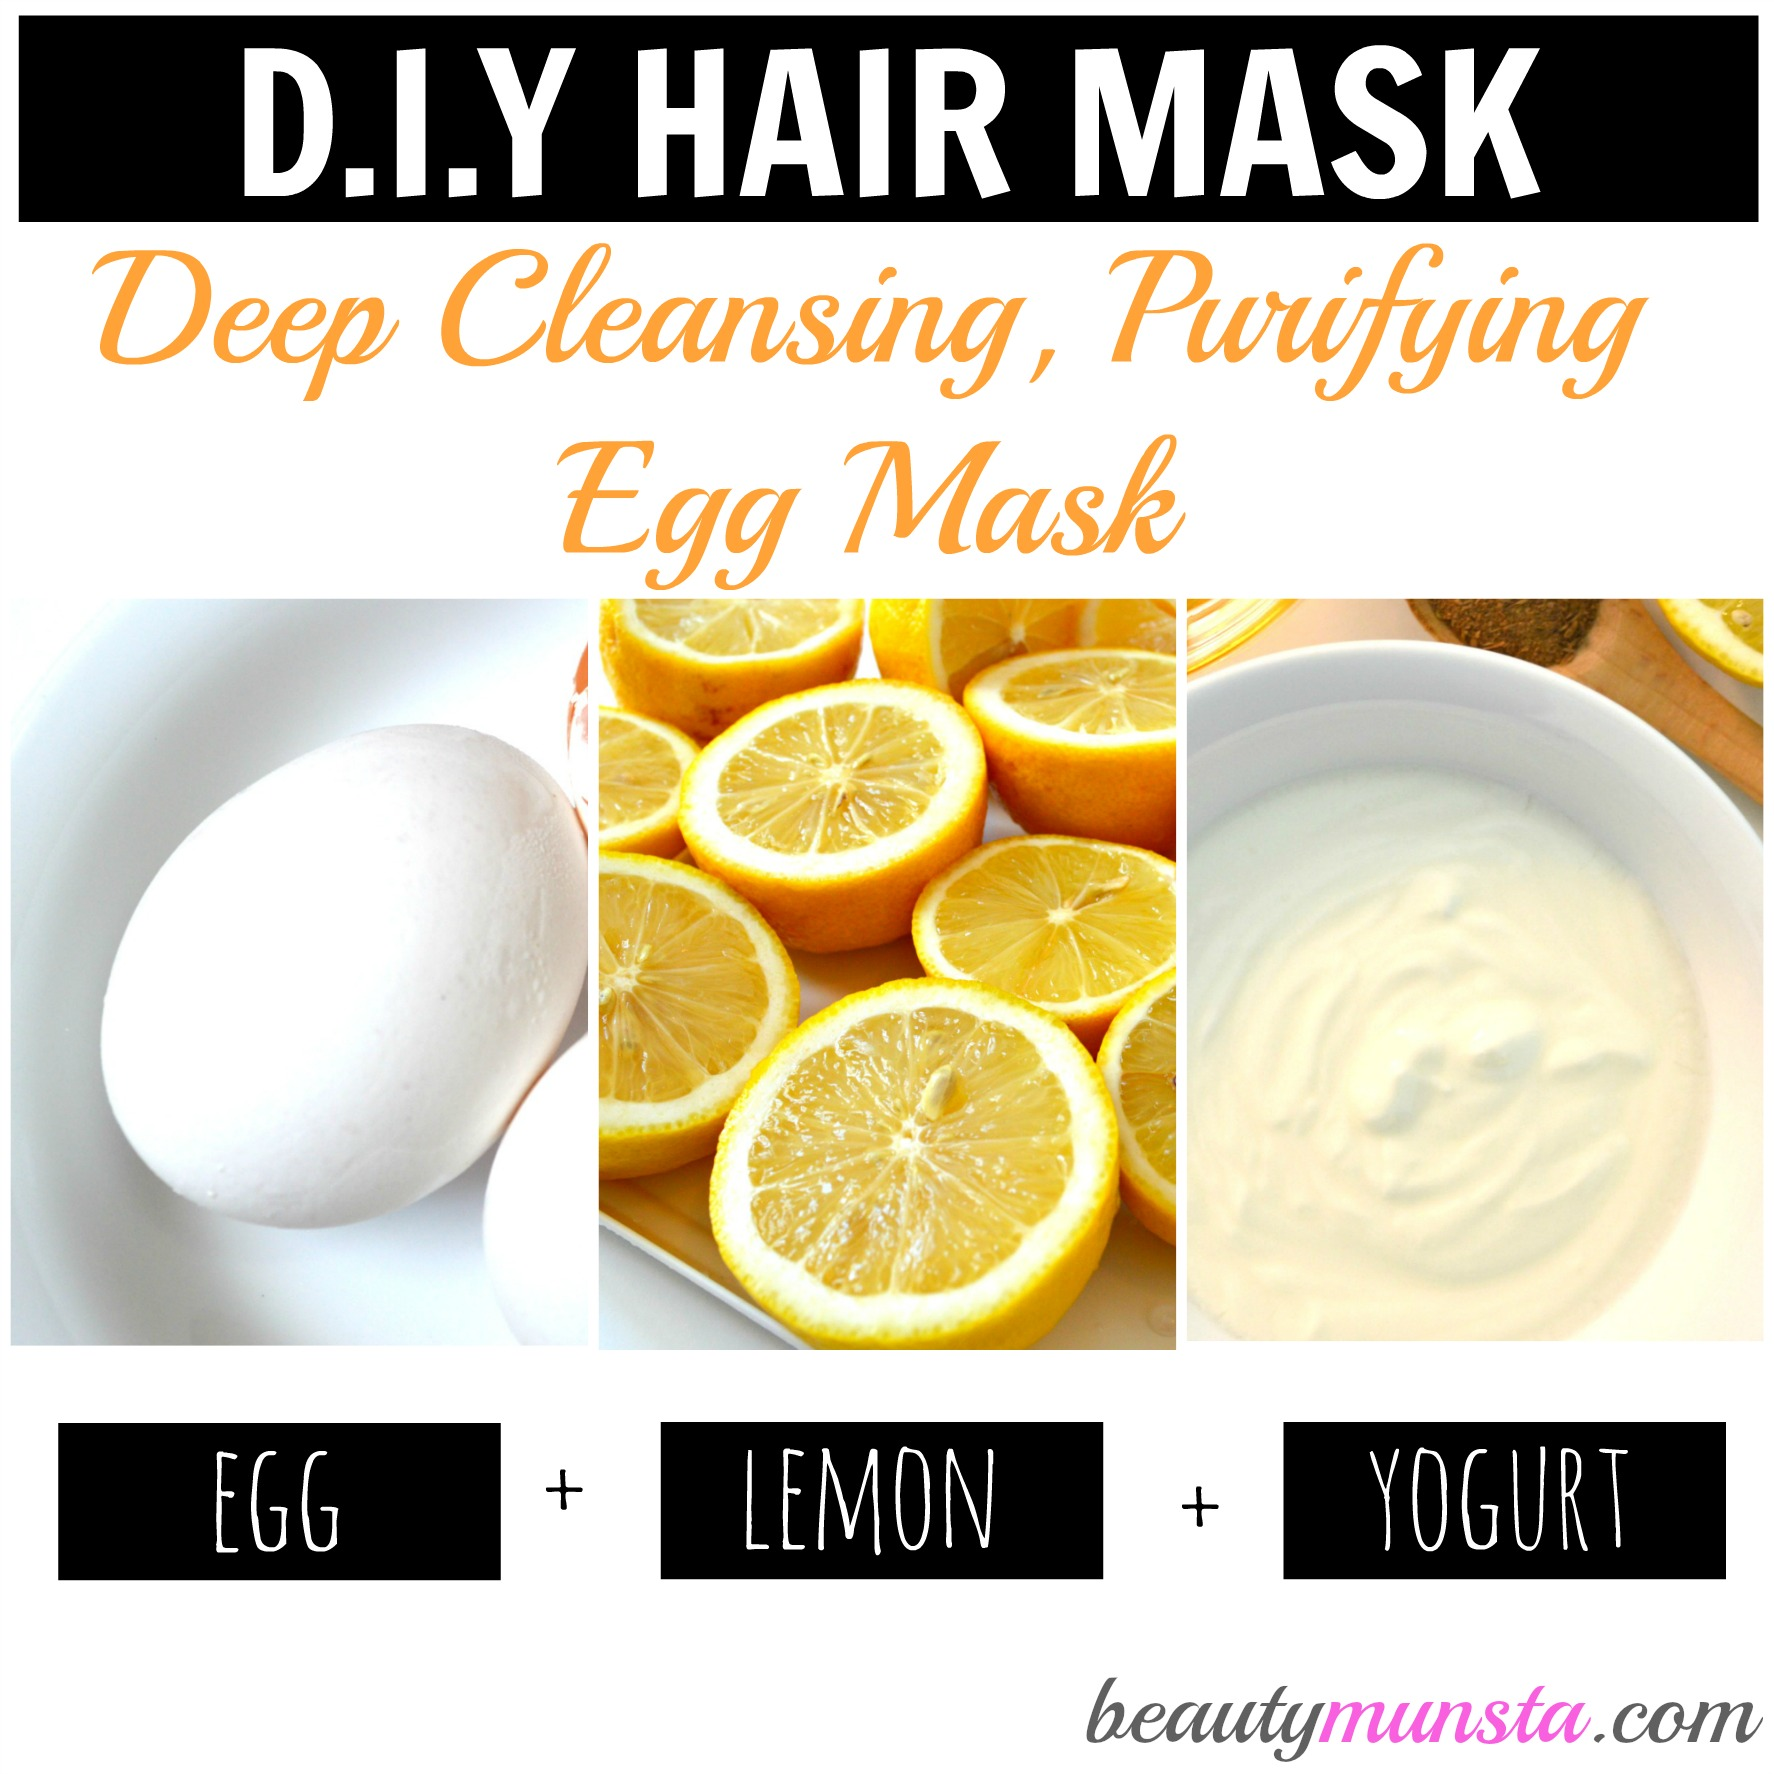 3 Egg Hair Mask Recipes for Gorgeous Hair - beautymunsta